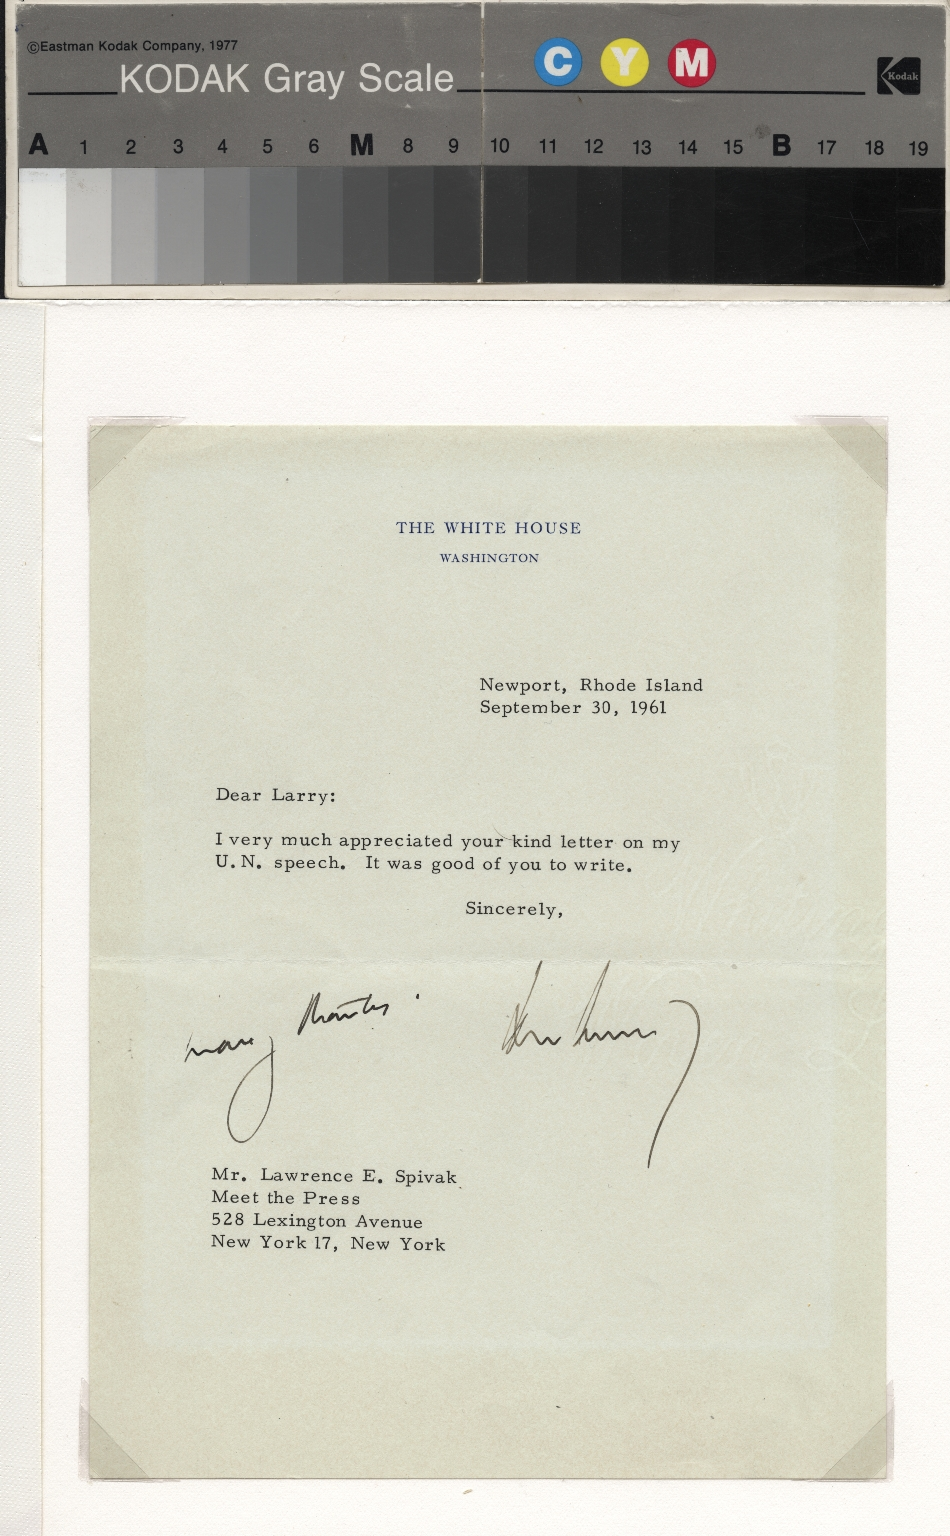 John Kennedy letter to Lawrence Spivak